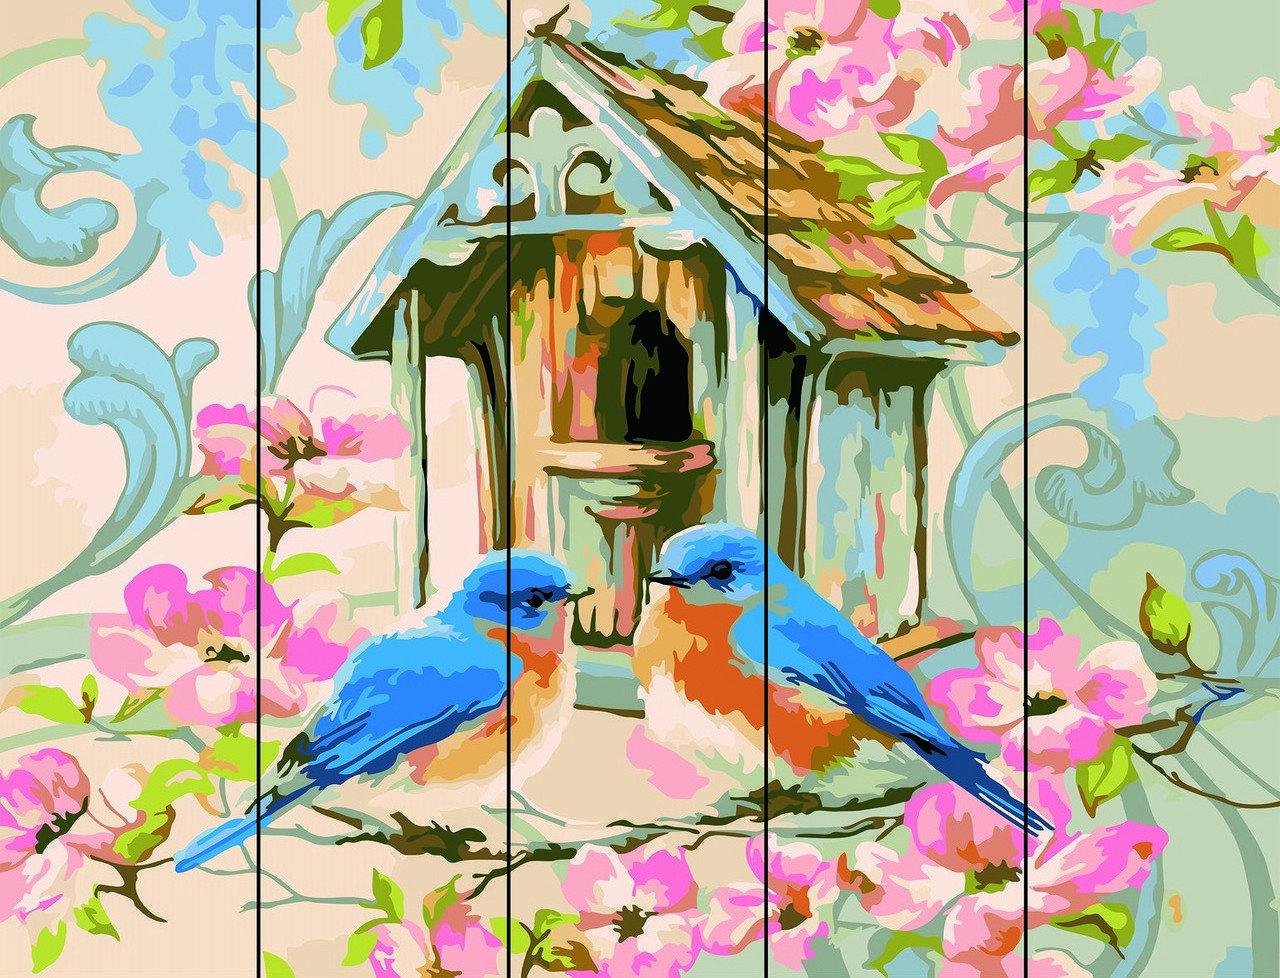 Картина по номерам по дереву Синички Rainbow Art RA-AS0057 40 х 50 см